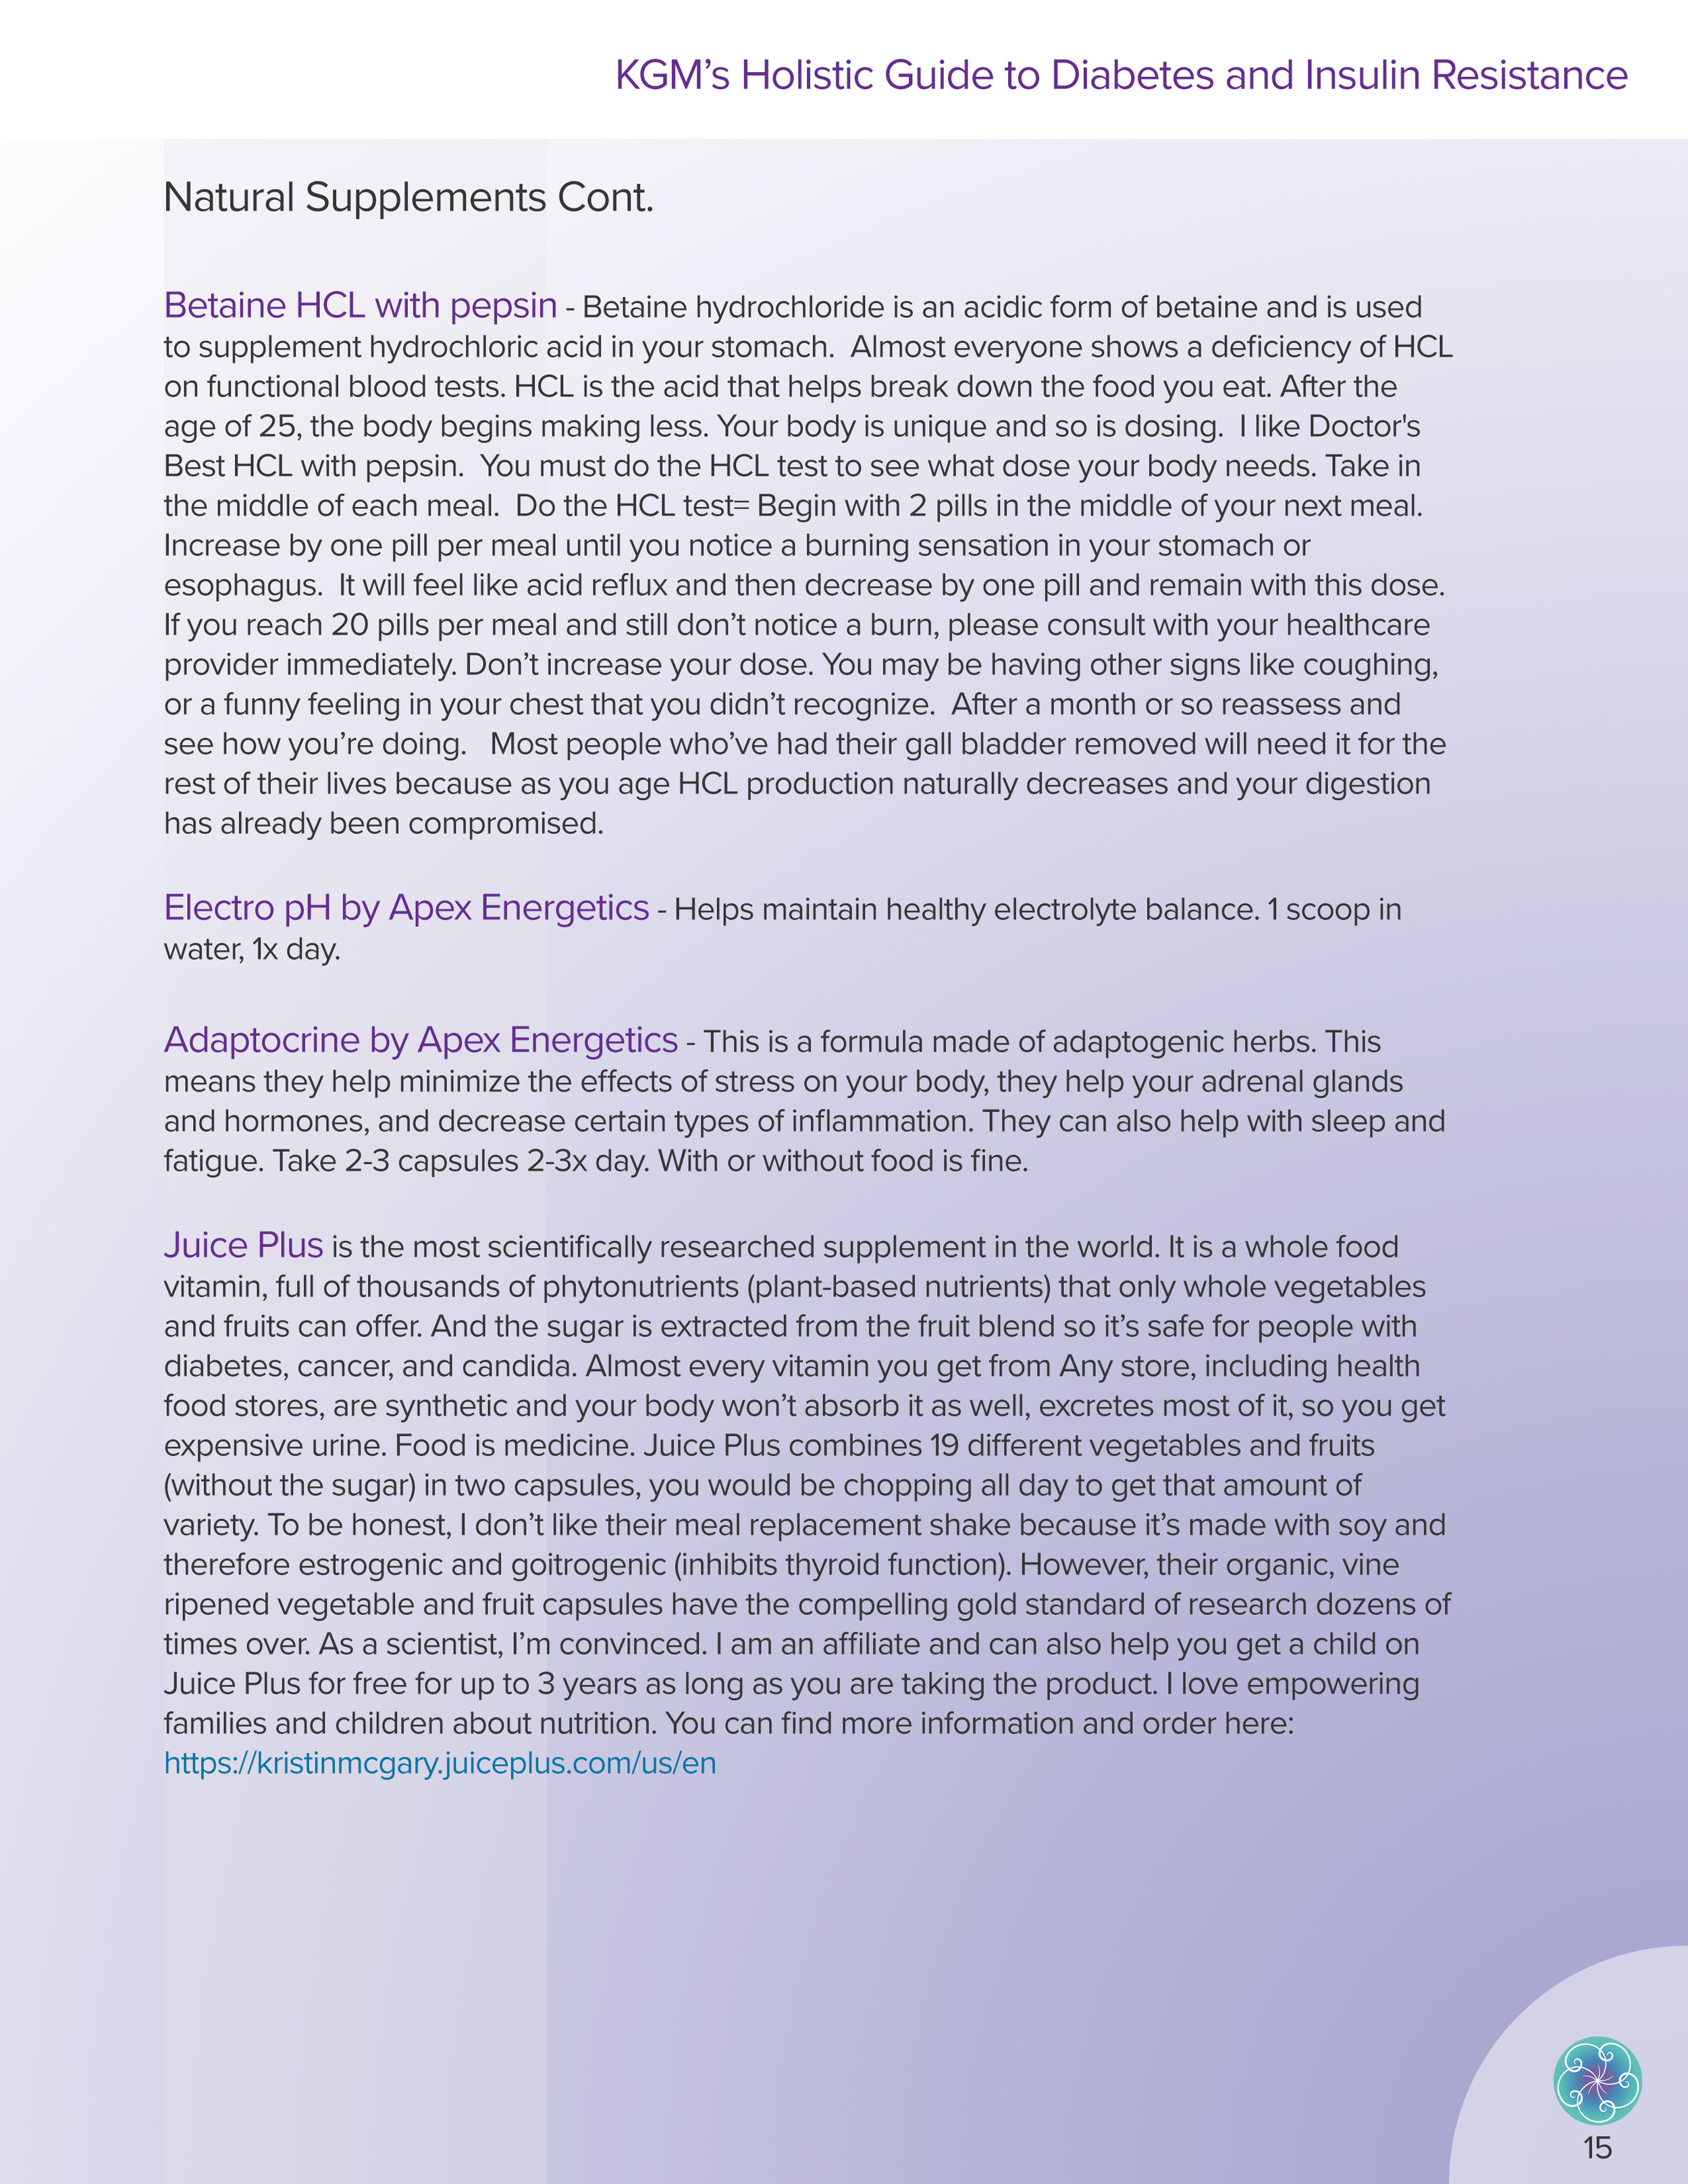 KGM_Insulin_Page15.jpg